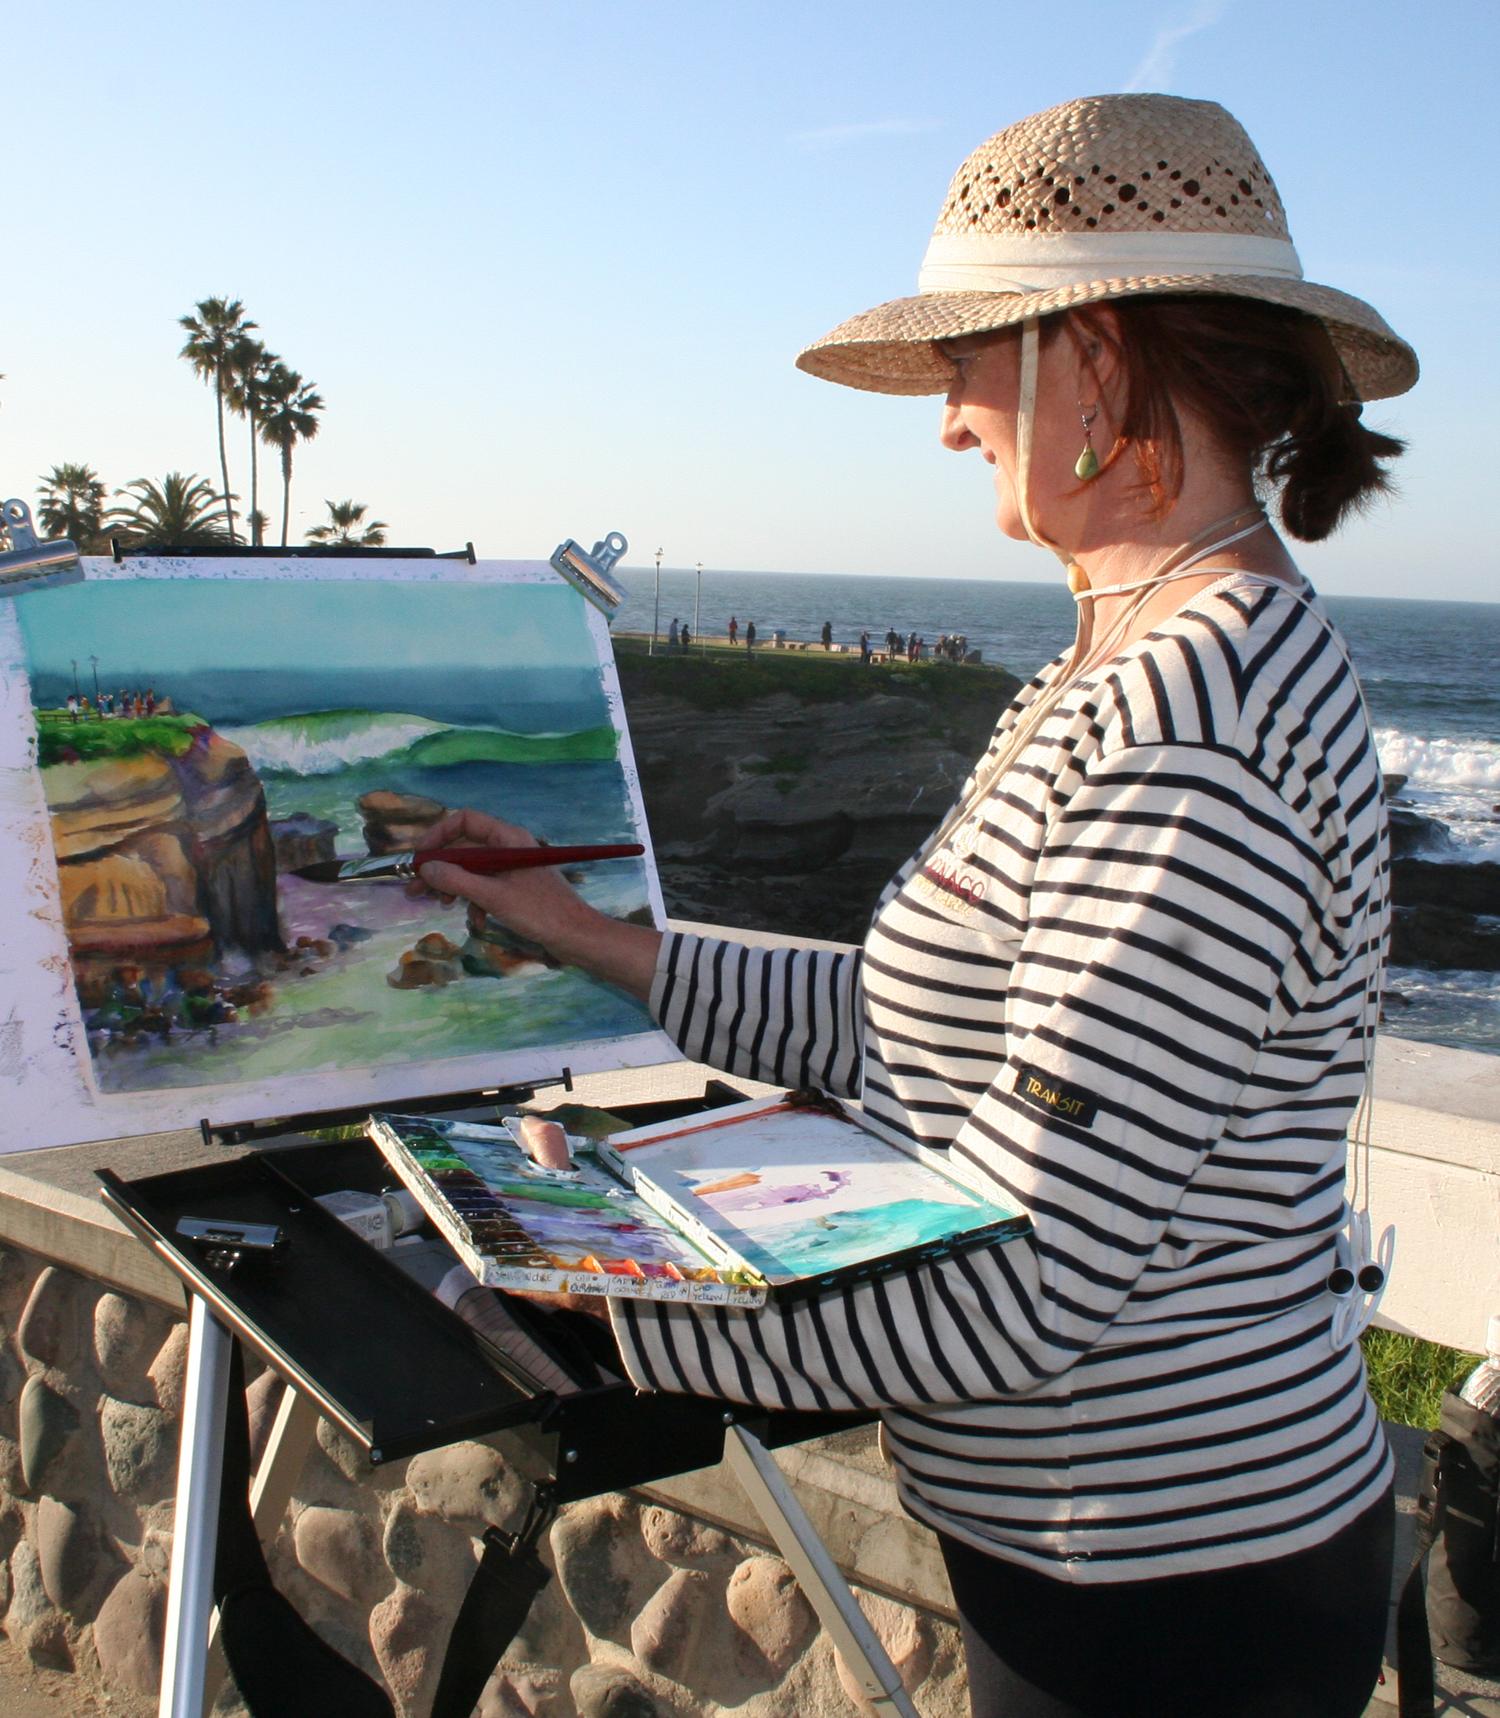 Plein Air Painting at La Jolla Cove  Deirdre O'Byrne